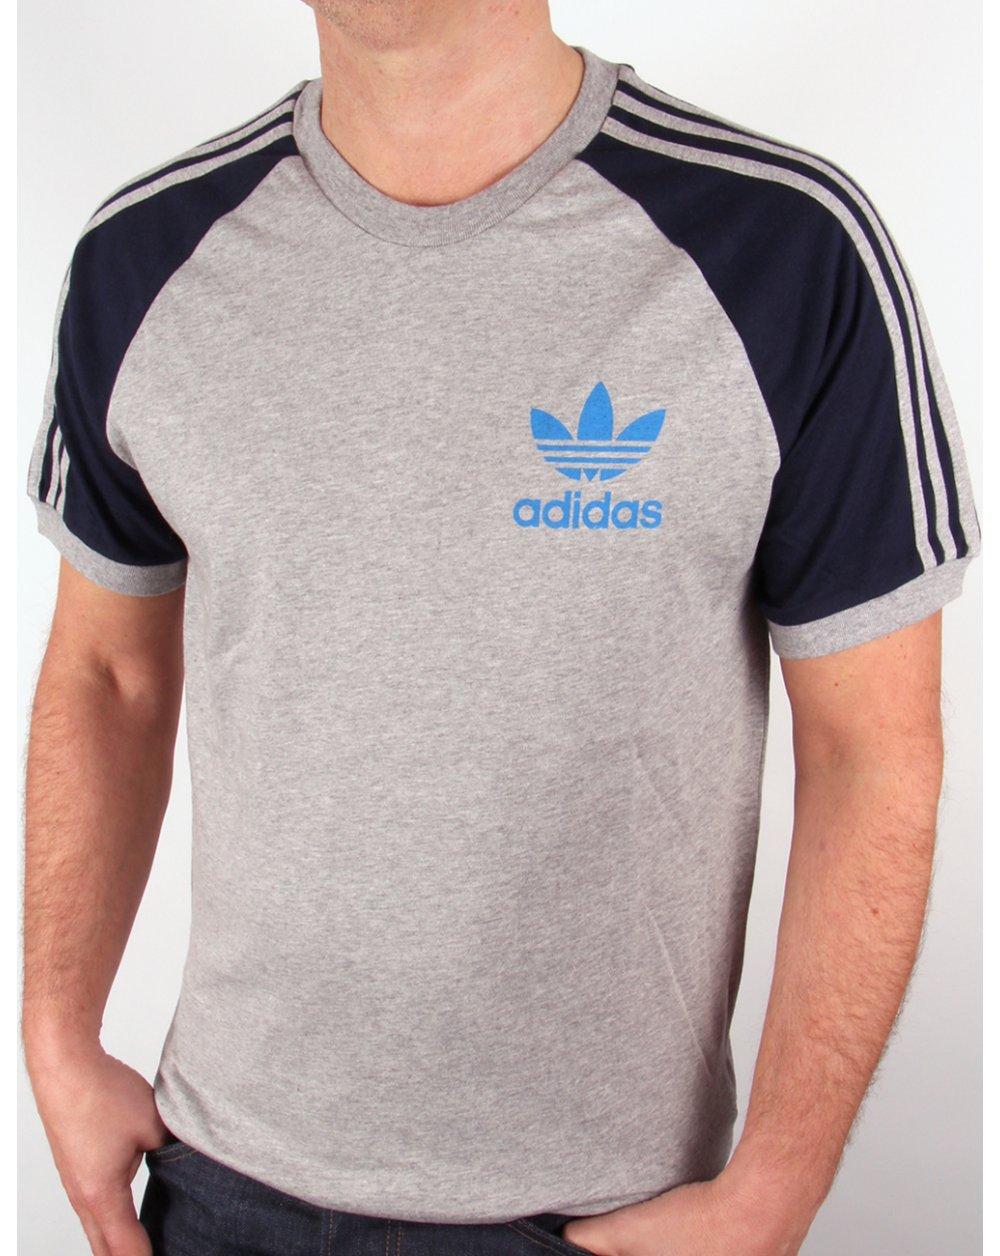 Adidas originals retro 3 stripes t shirt heather grey navy for Mens heather grey t shirt